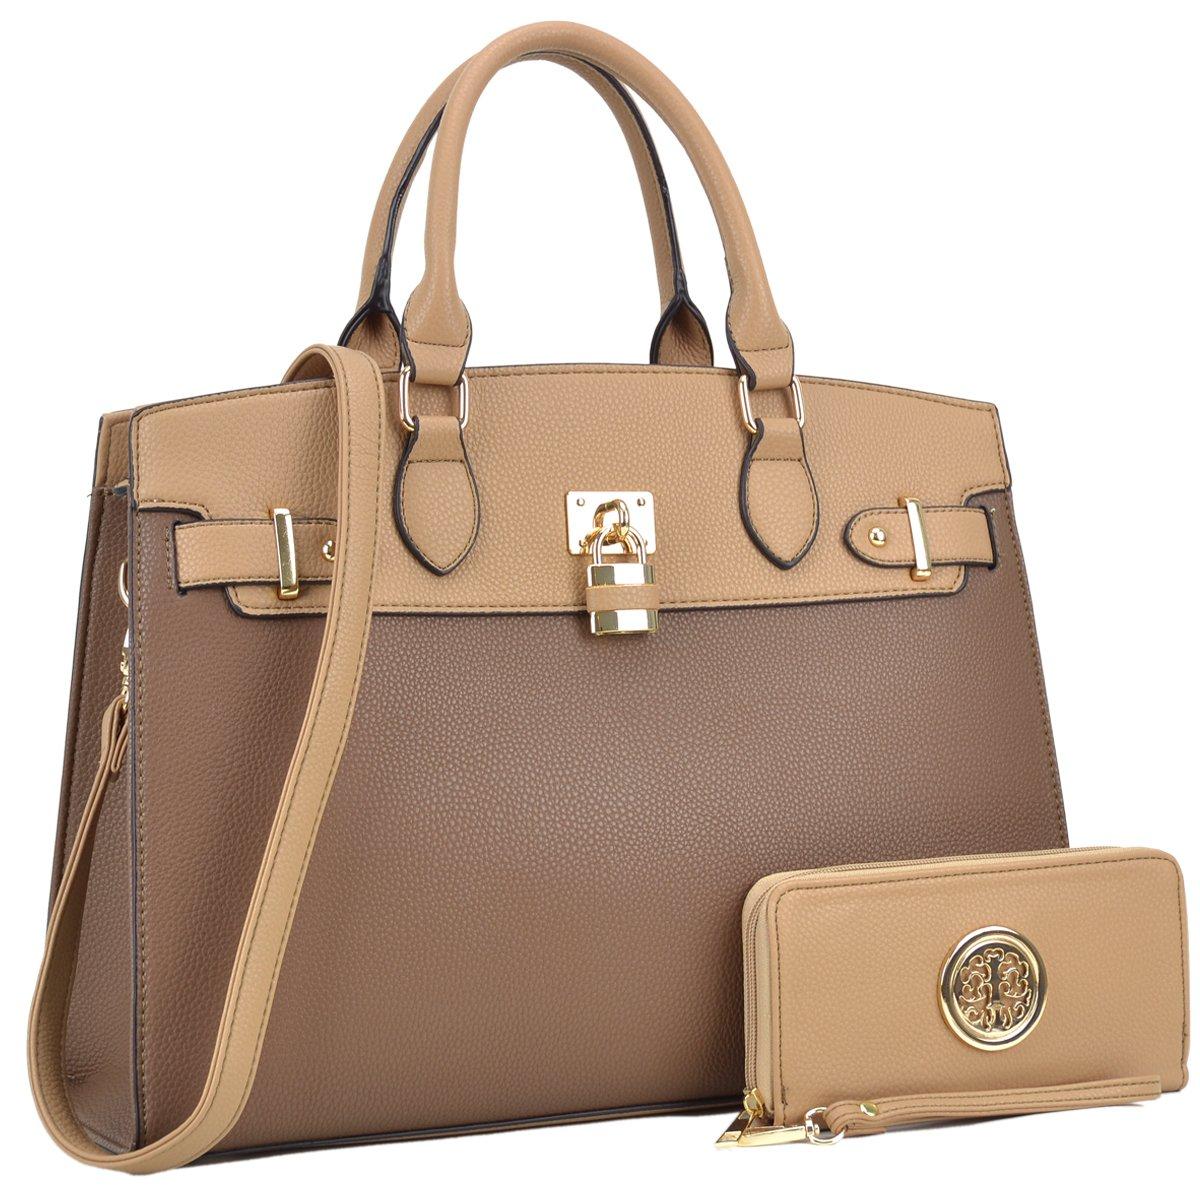 Fashion Woman Handbag &Wallet Lady Tote Designer Satchel Top Handle Purse Cross-body 6876 KH